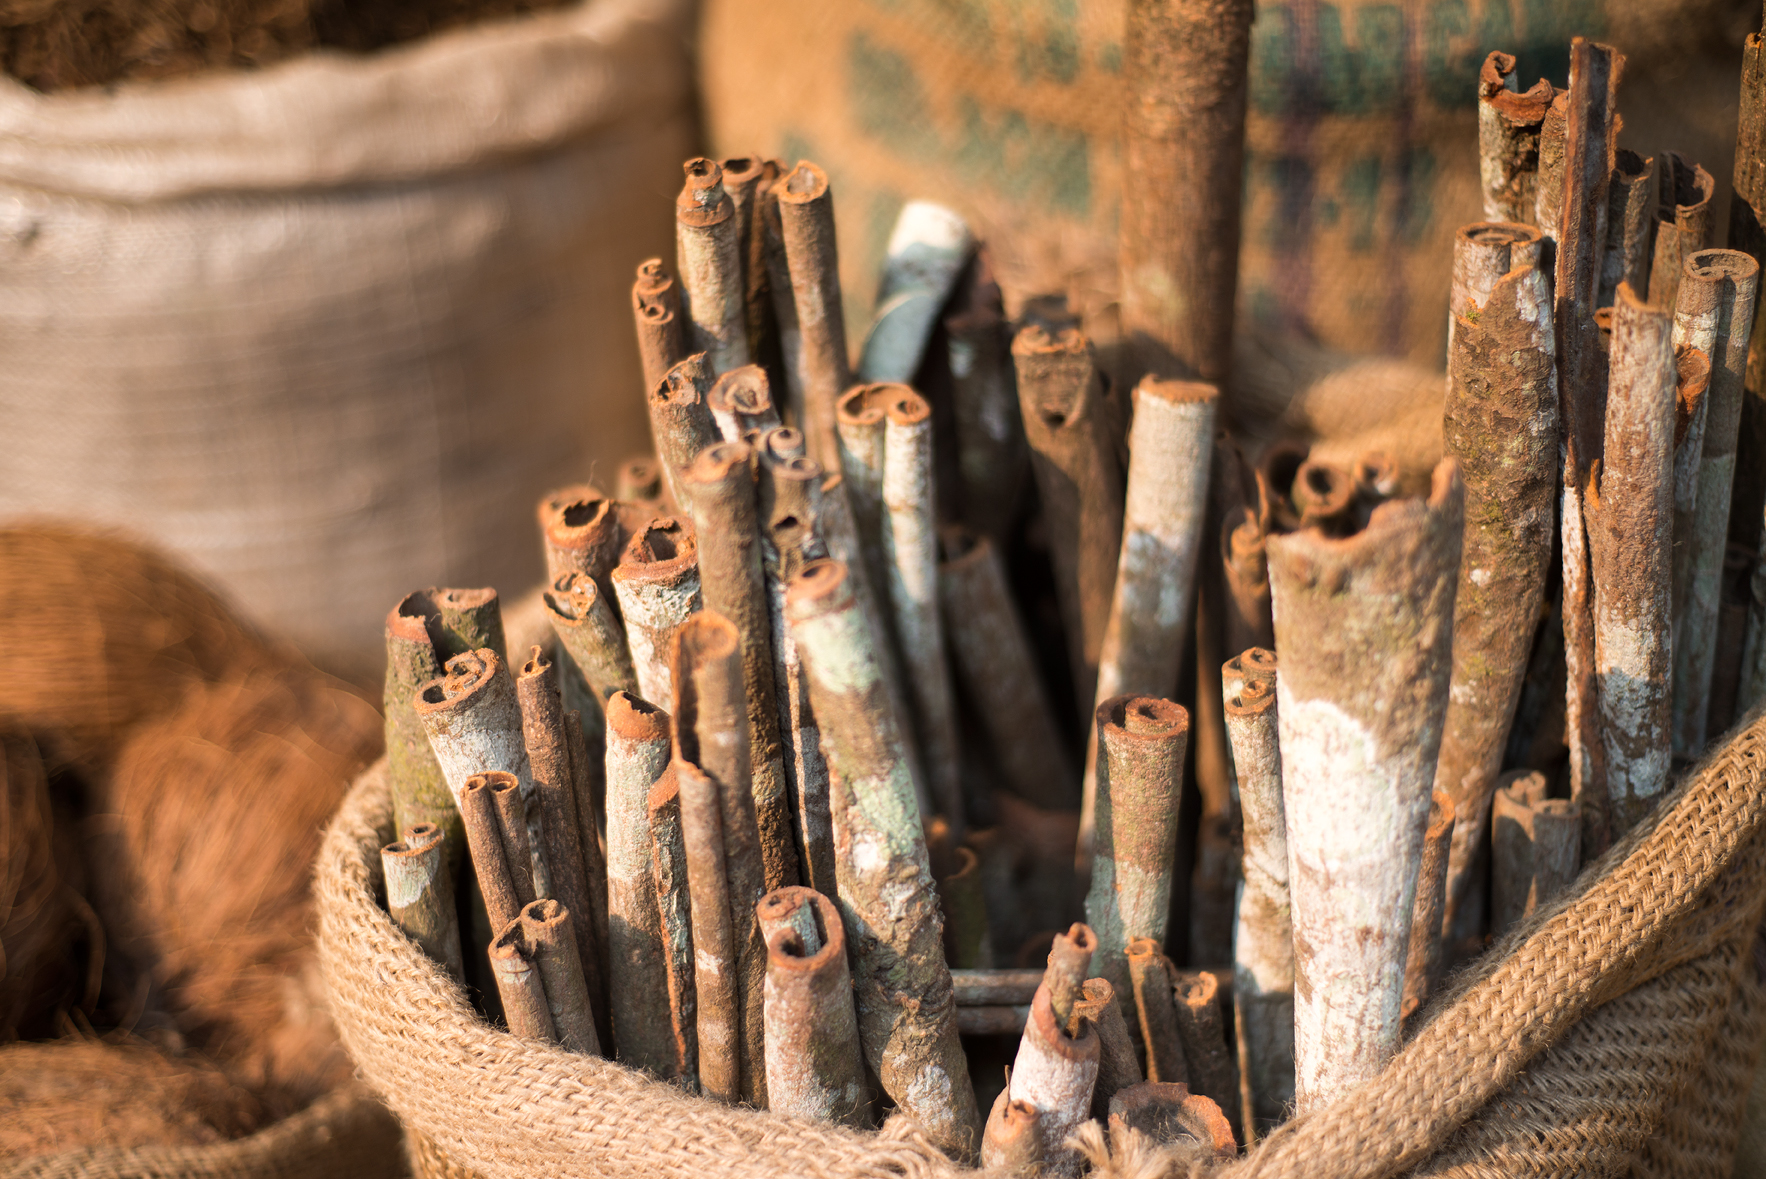 delhi india spices wholesale bags of cinnamon